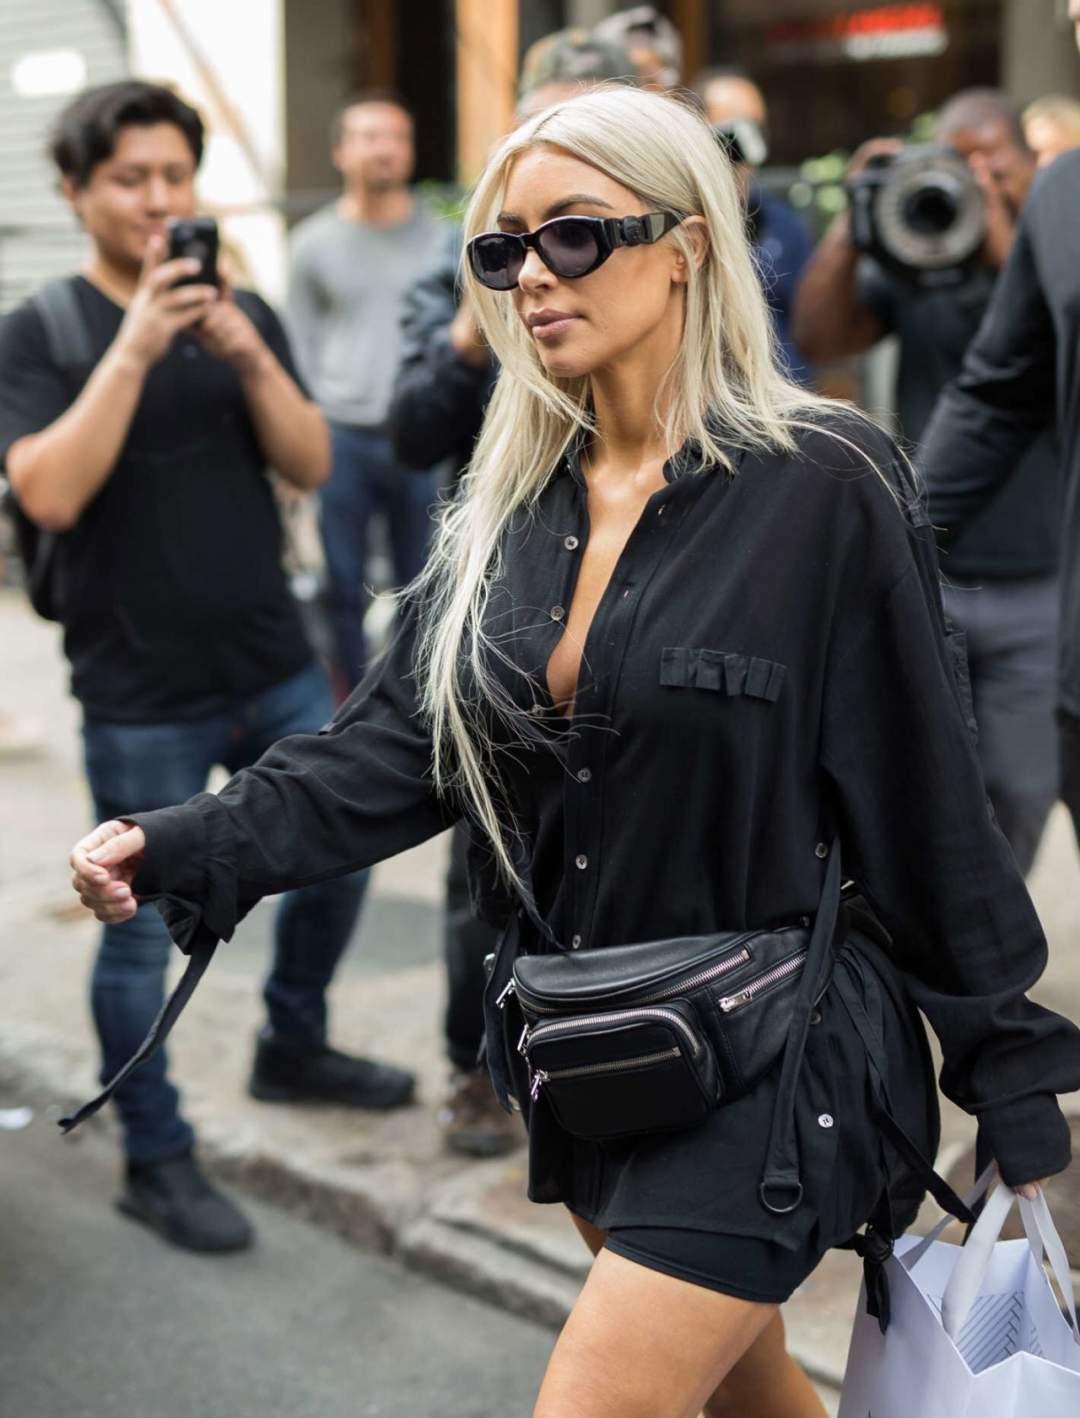 Kim Kardarshian Wearing Fanny Pack E1546531197619